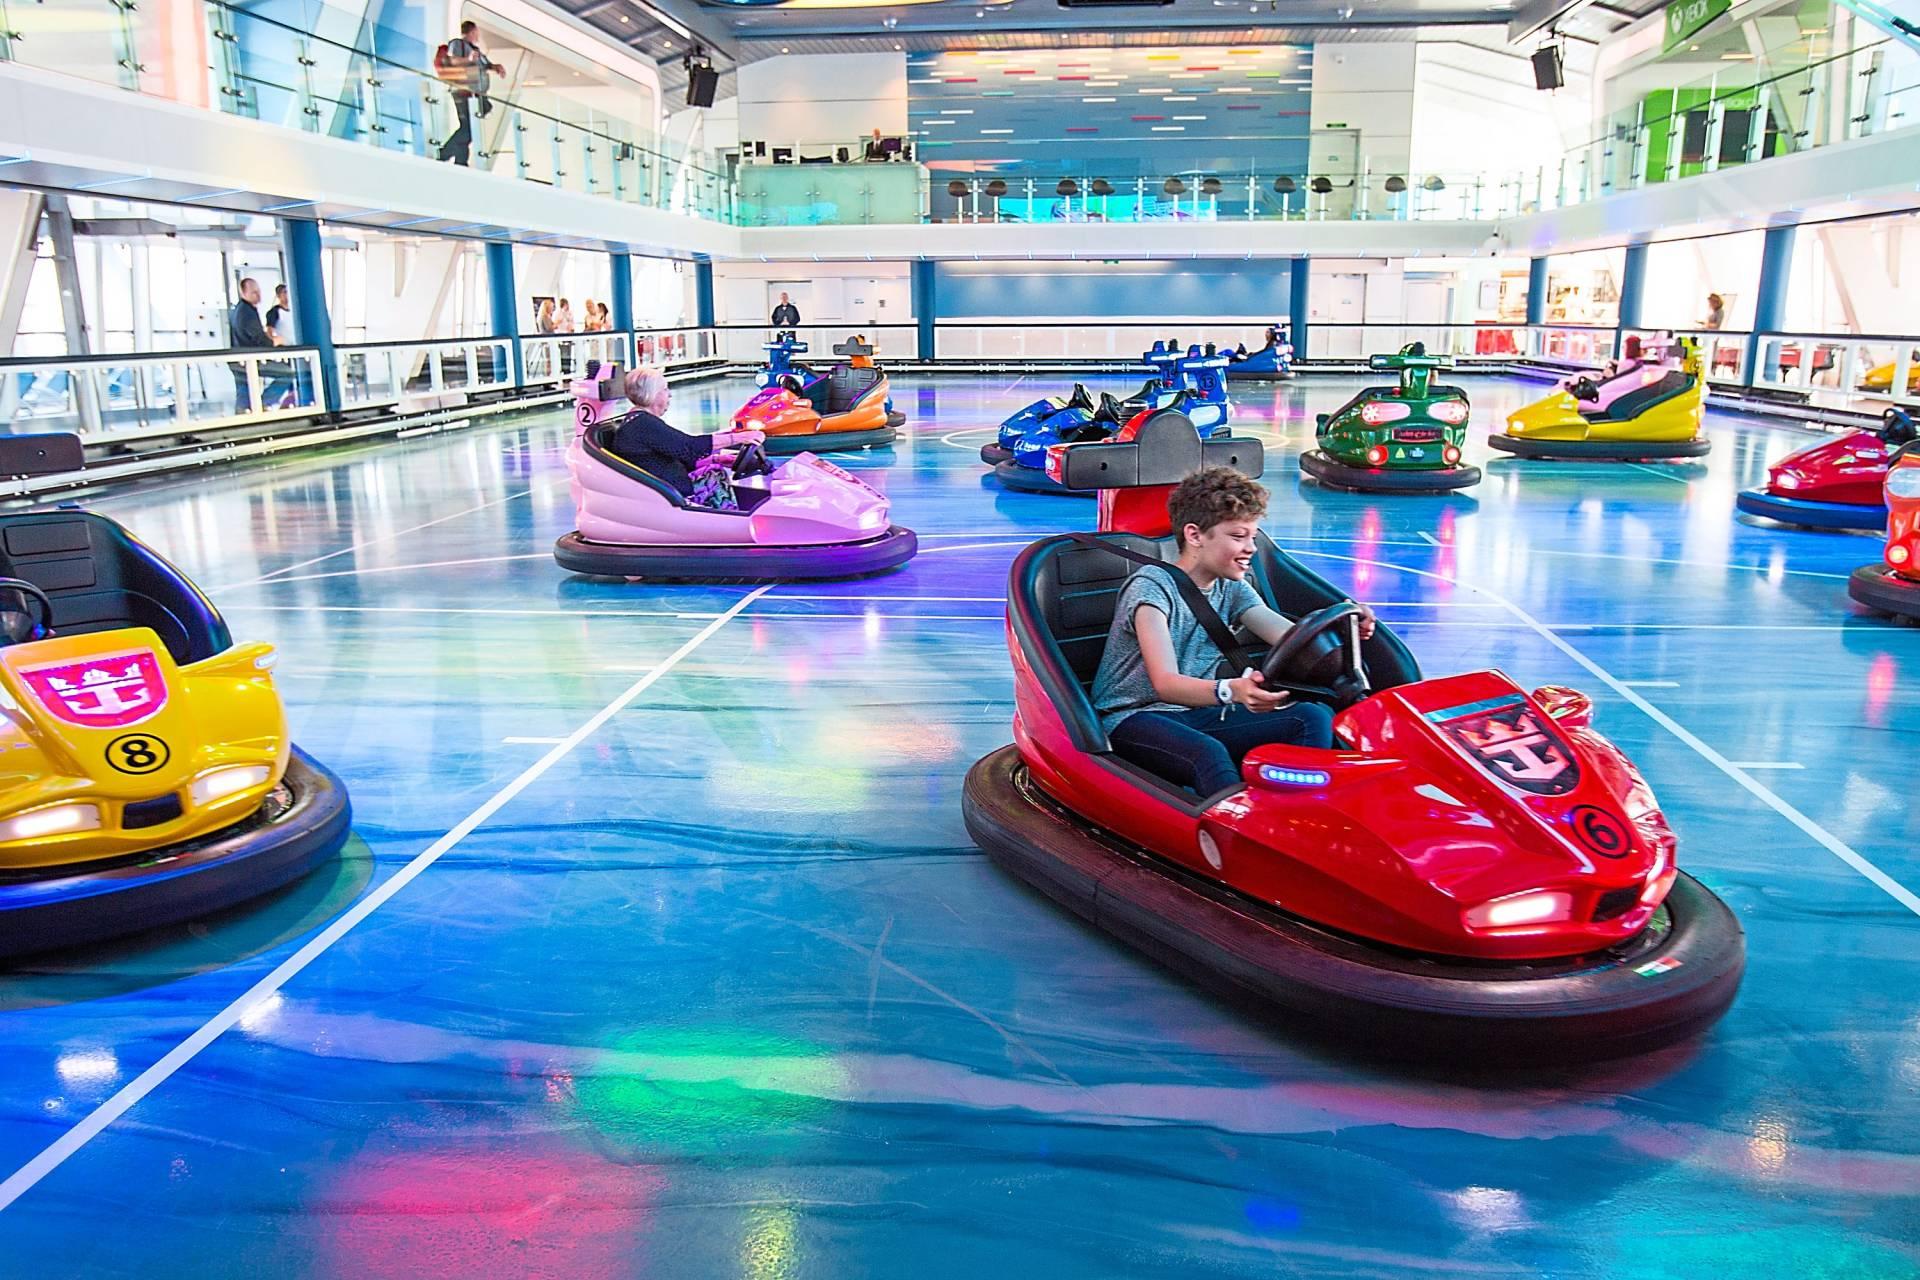 Bumper cars at SeaPlex, the on board sports venue. Photo: Royal Caribbean International